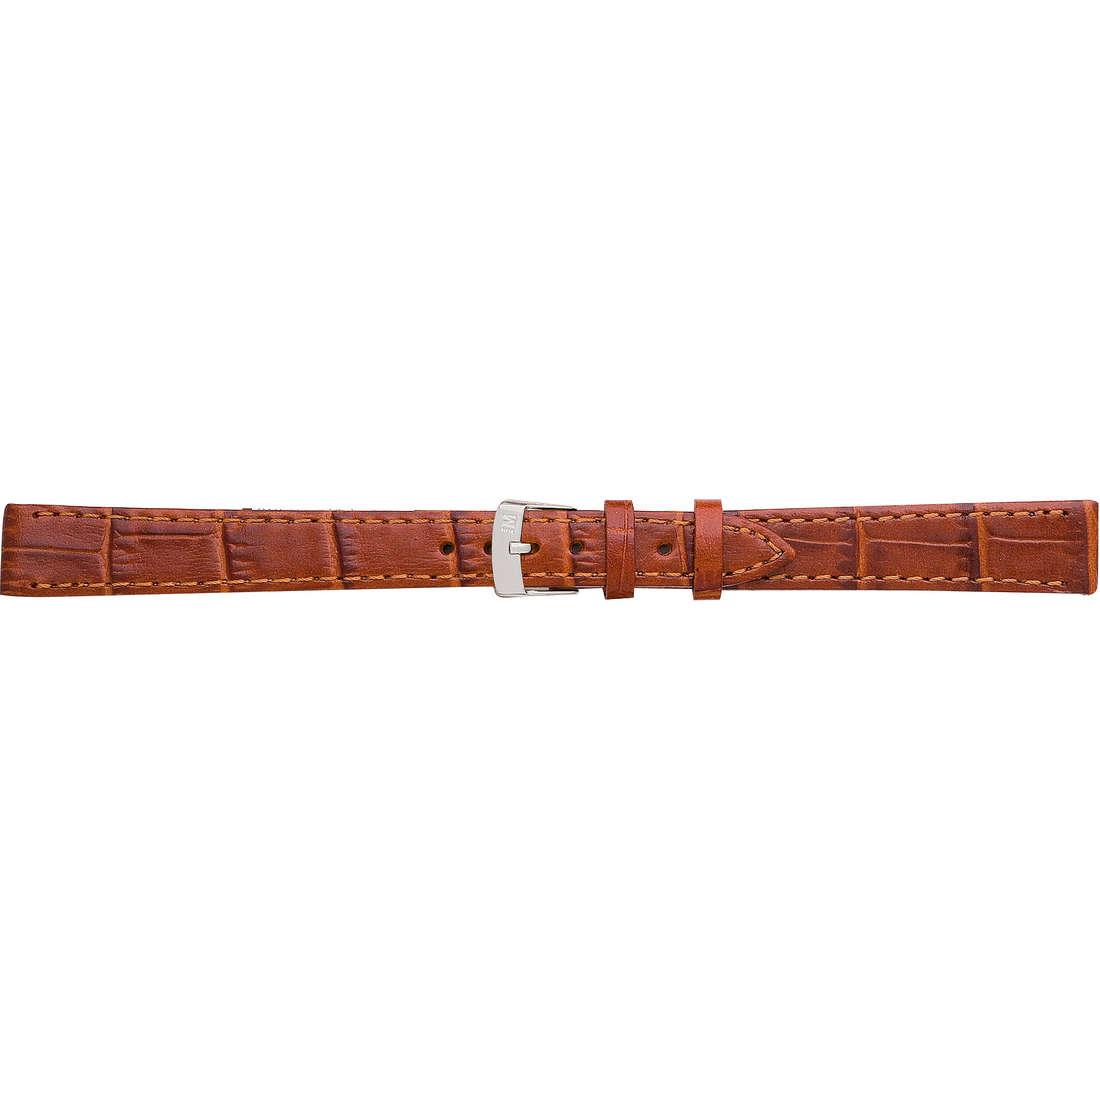 montre bande de montres unisex Morellato I Lunghi A01Y2524656041CR14